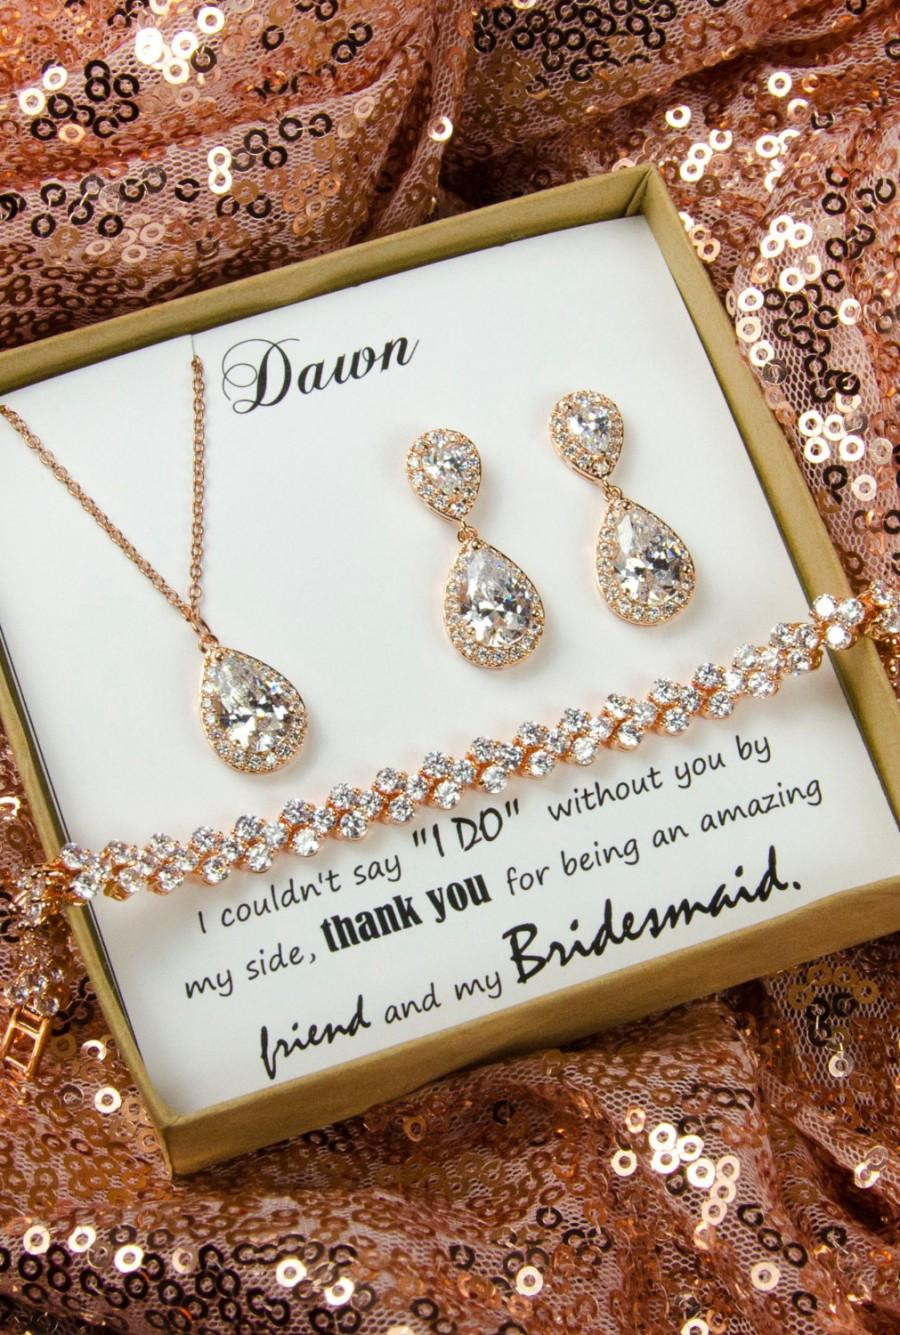 Mariage - Wedding Jewelry Bridesmaid Gift Bridesmaid Jewelry Bridal Jewelry cubic zircon bracelet,bridal crystal bracelet,personalized bridesmaid gift